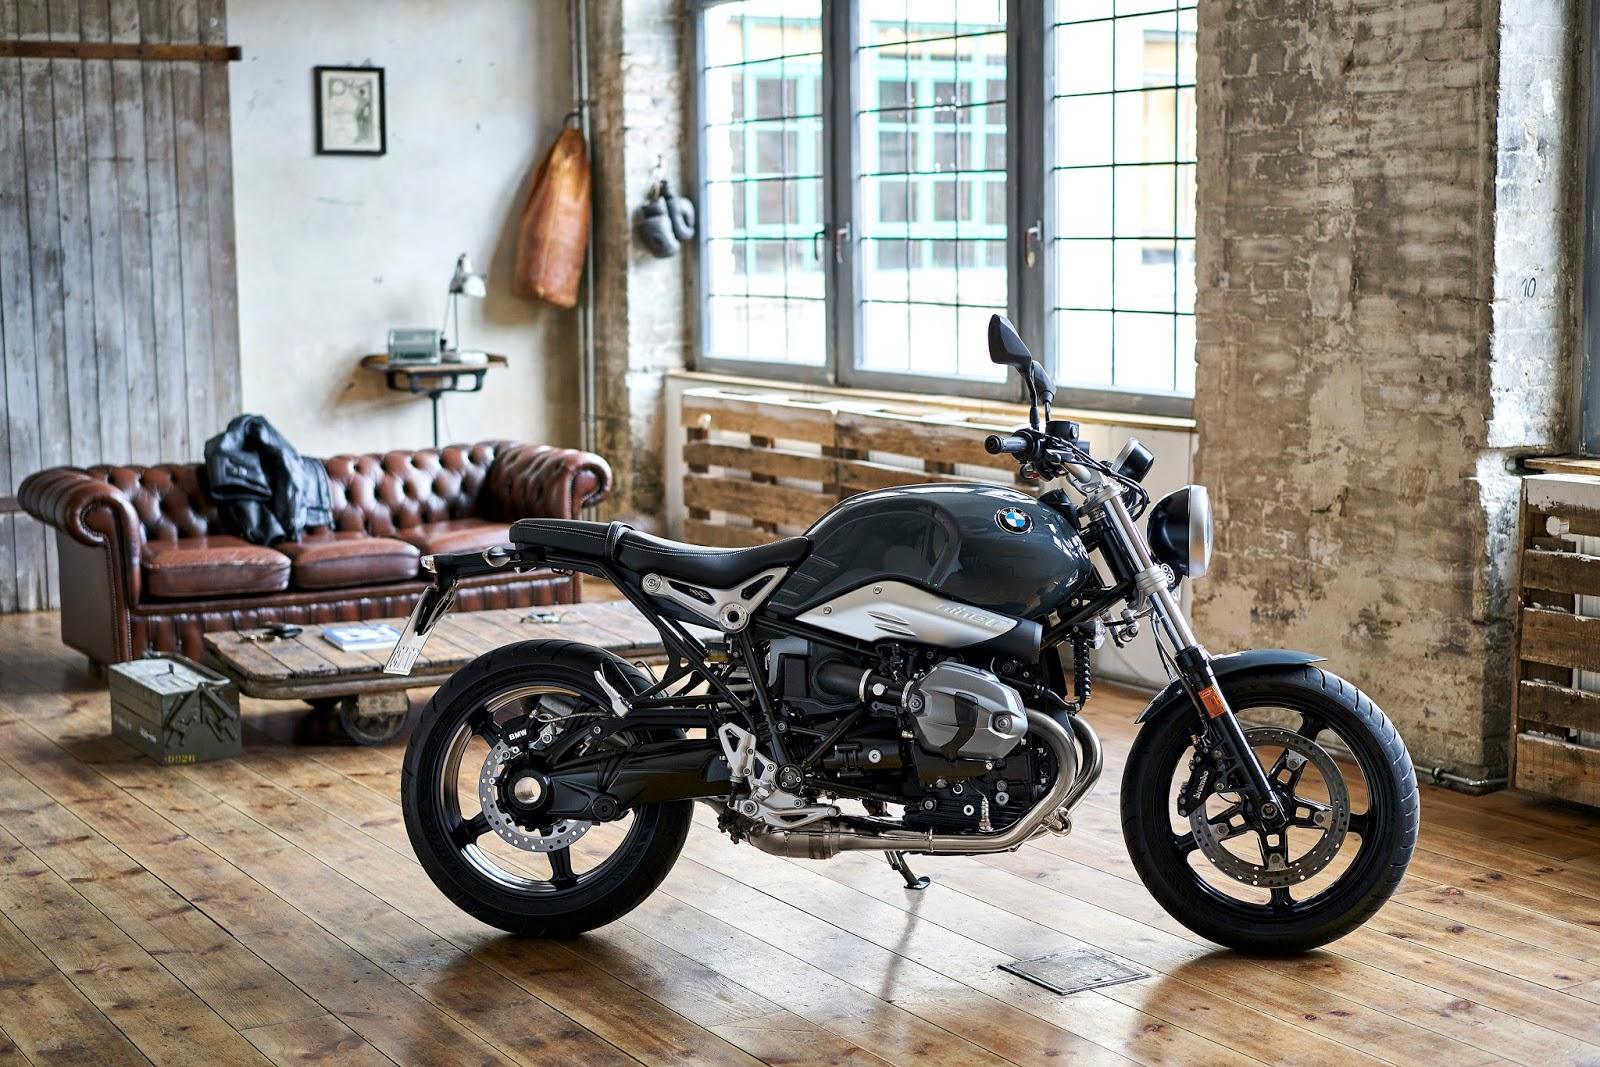 bmw motorrad uk meet the r ninet pure. Black Bedroom Furniture Sets. Home Design Ideas